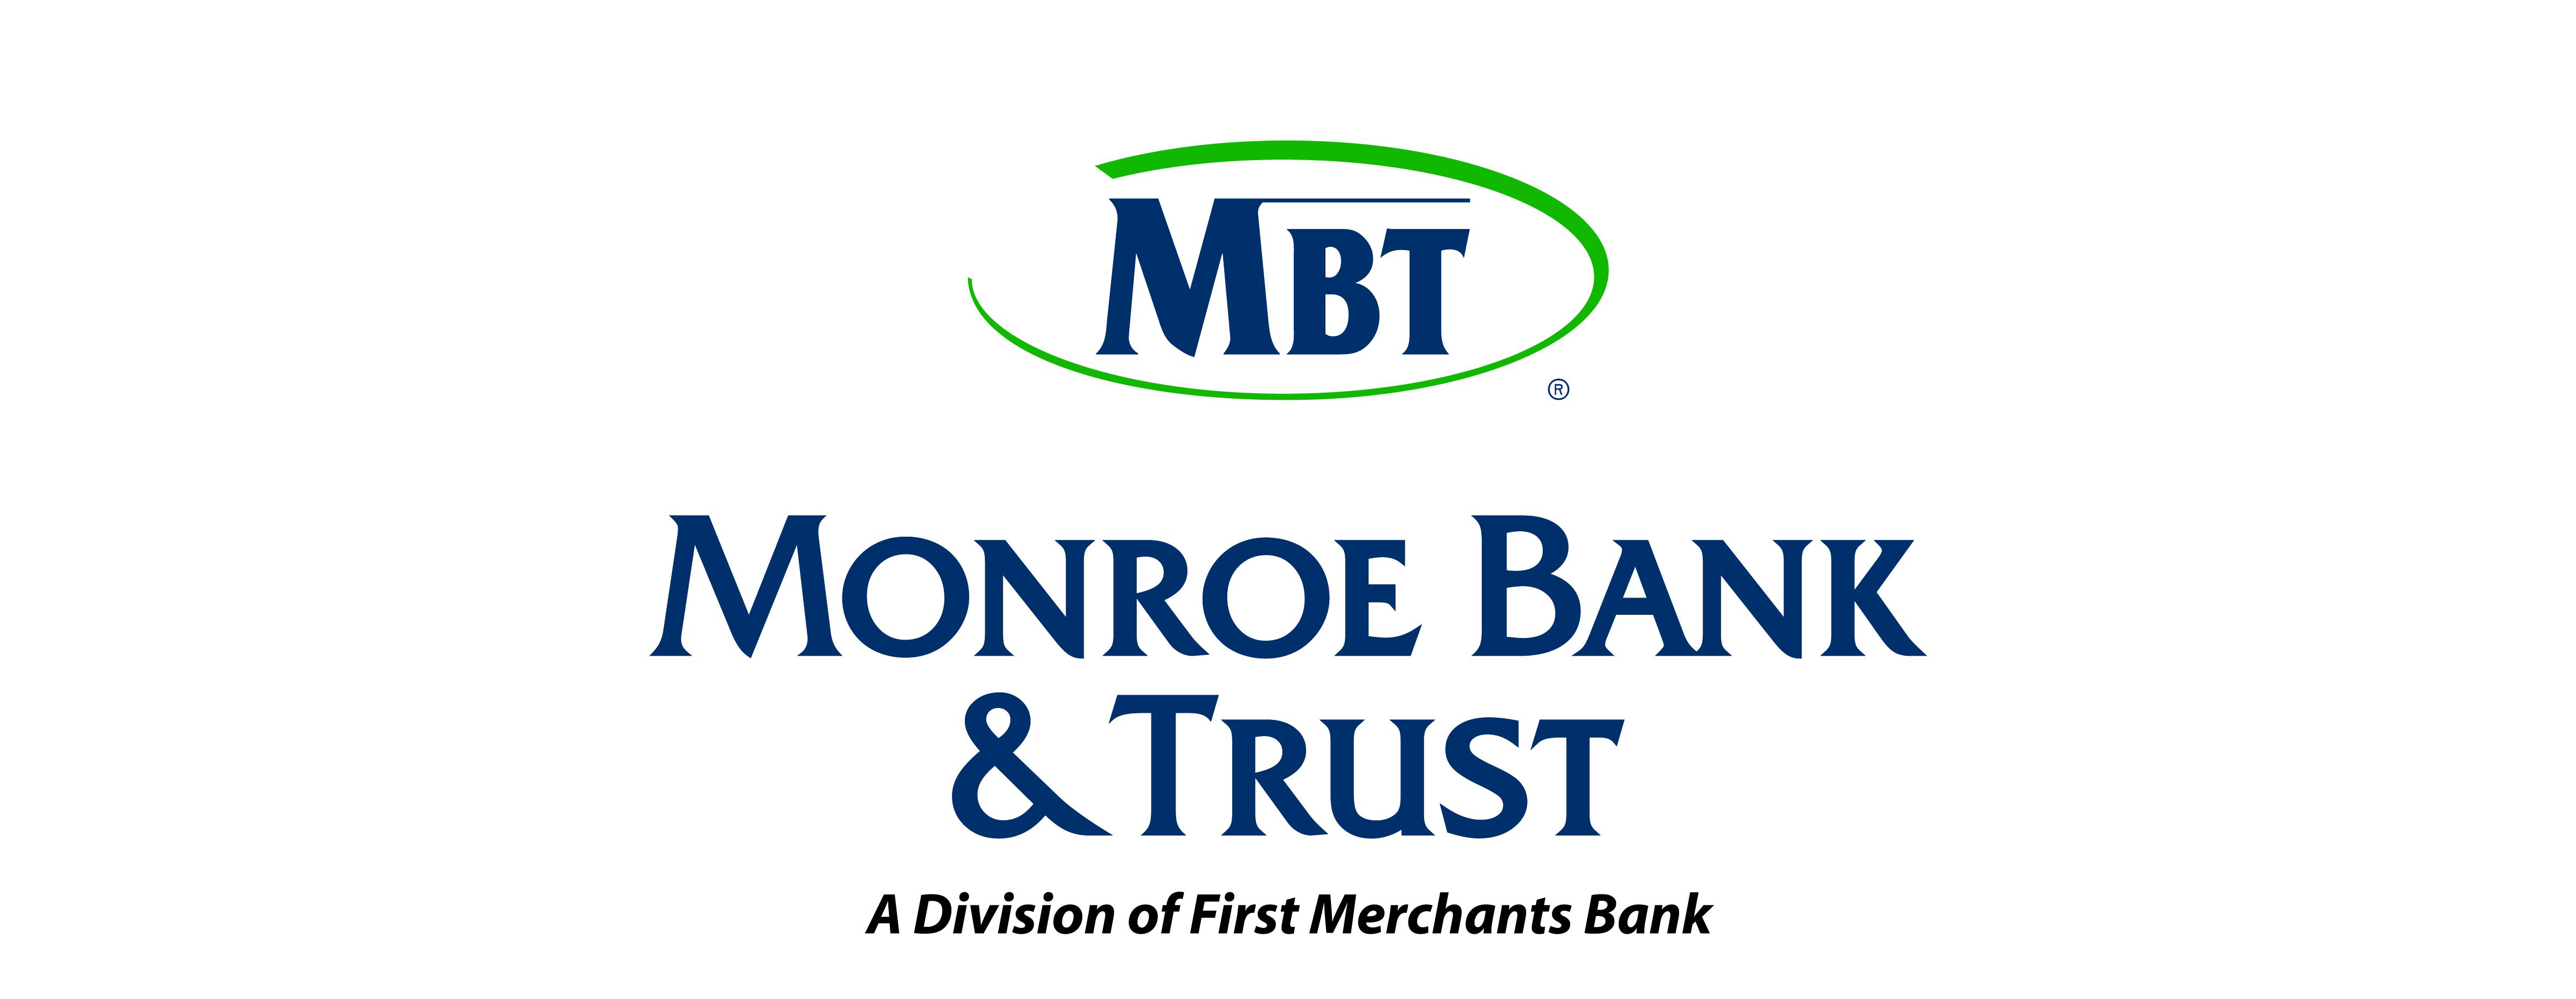 MonroeBank_COLOR_Logo_1147x445_USE_ADivisionof